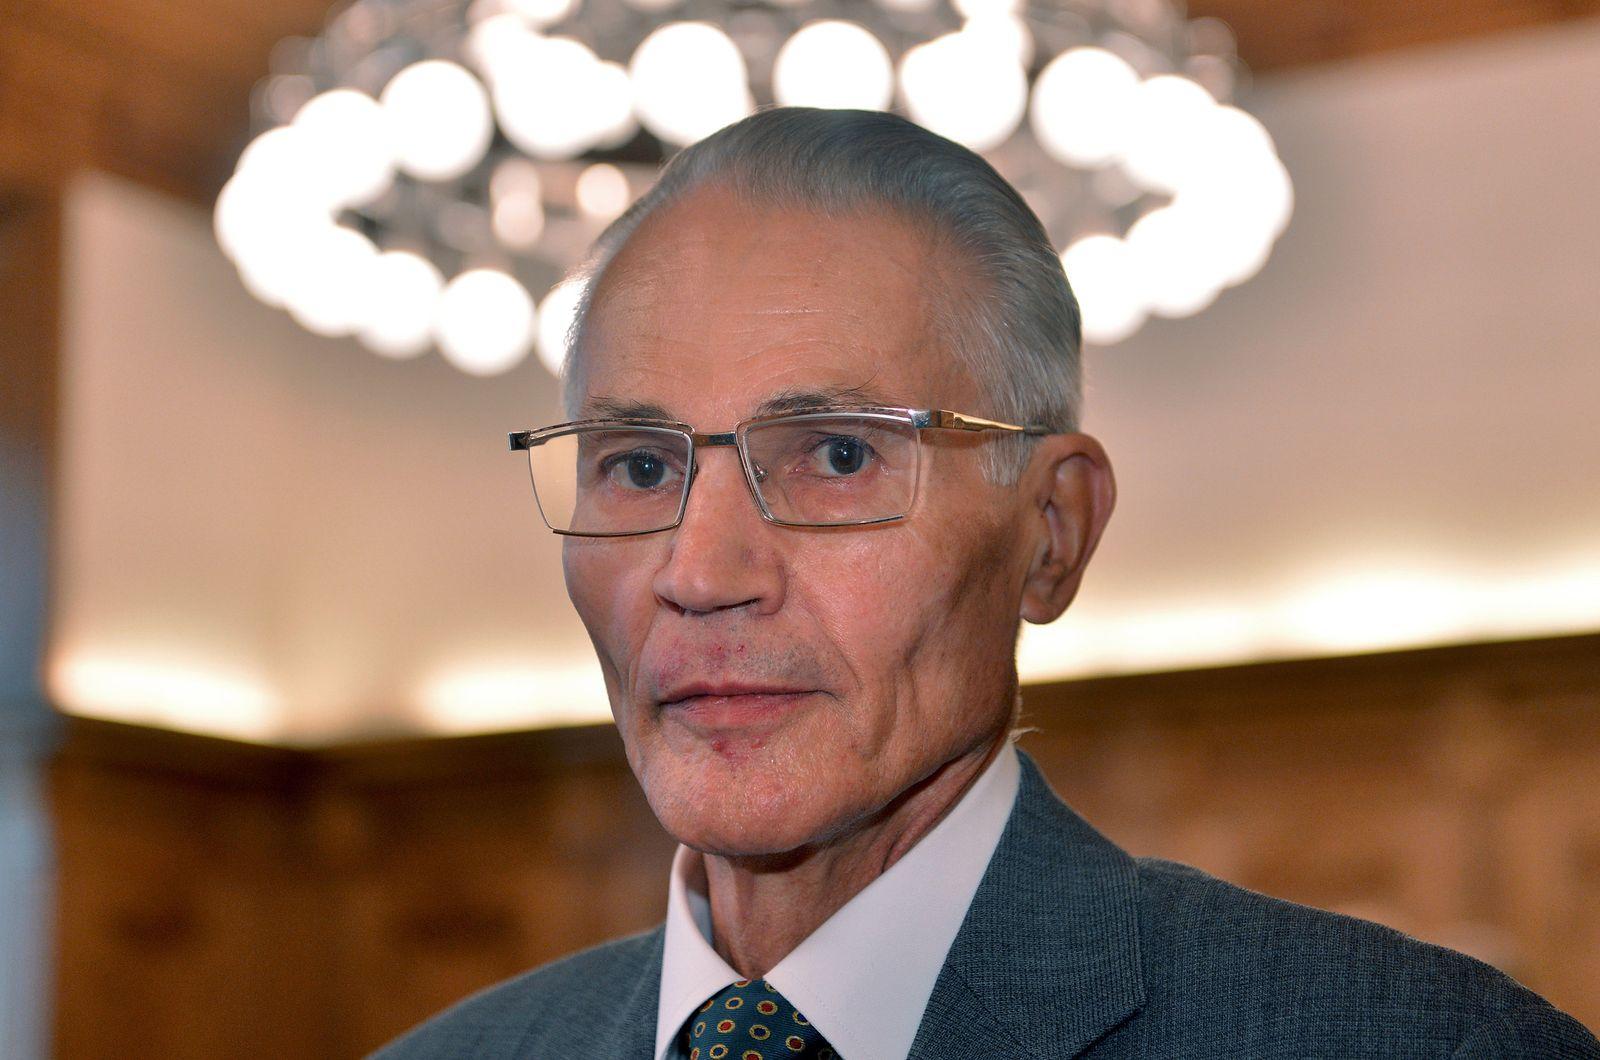 Hartmut Zapp